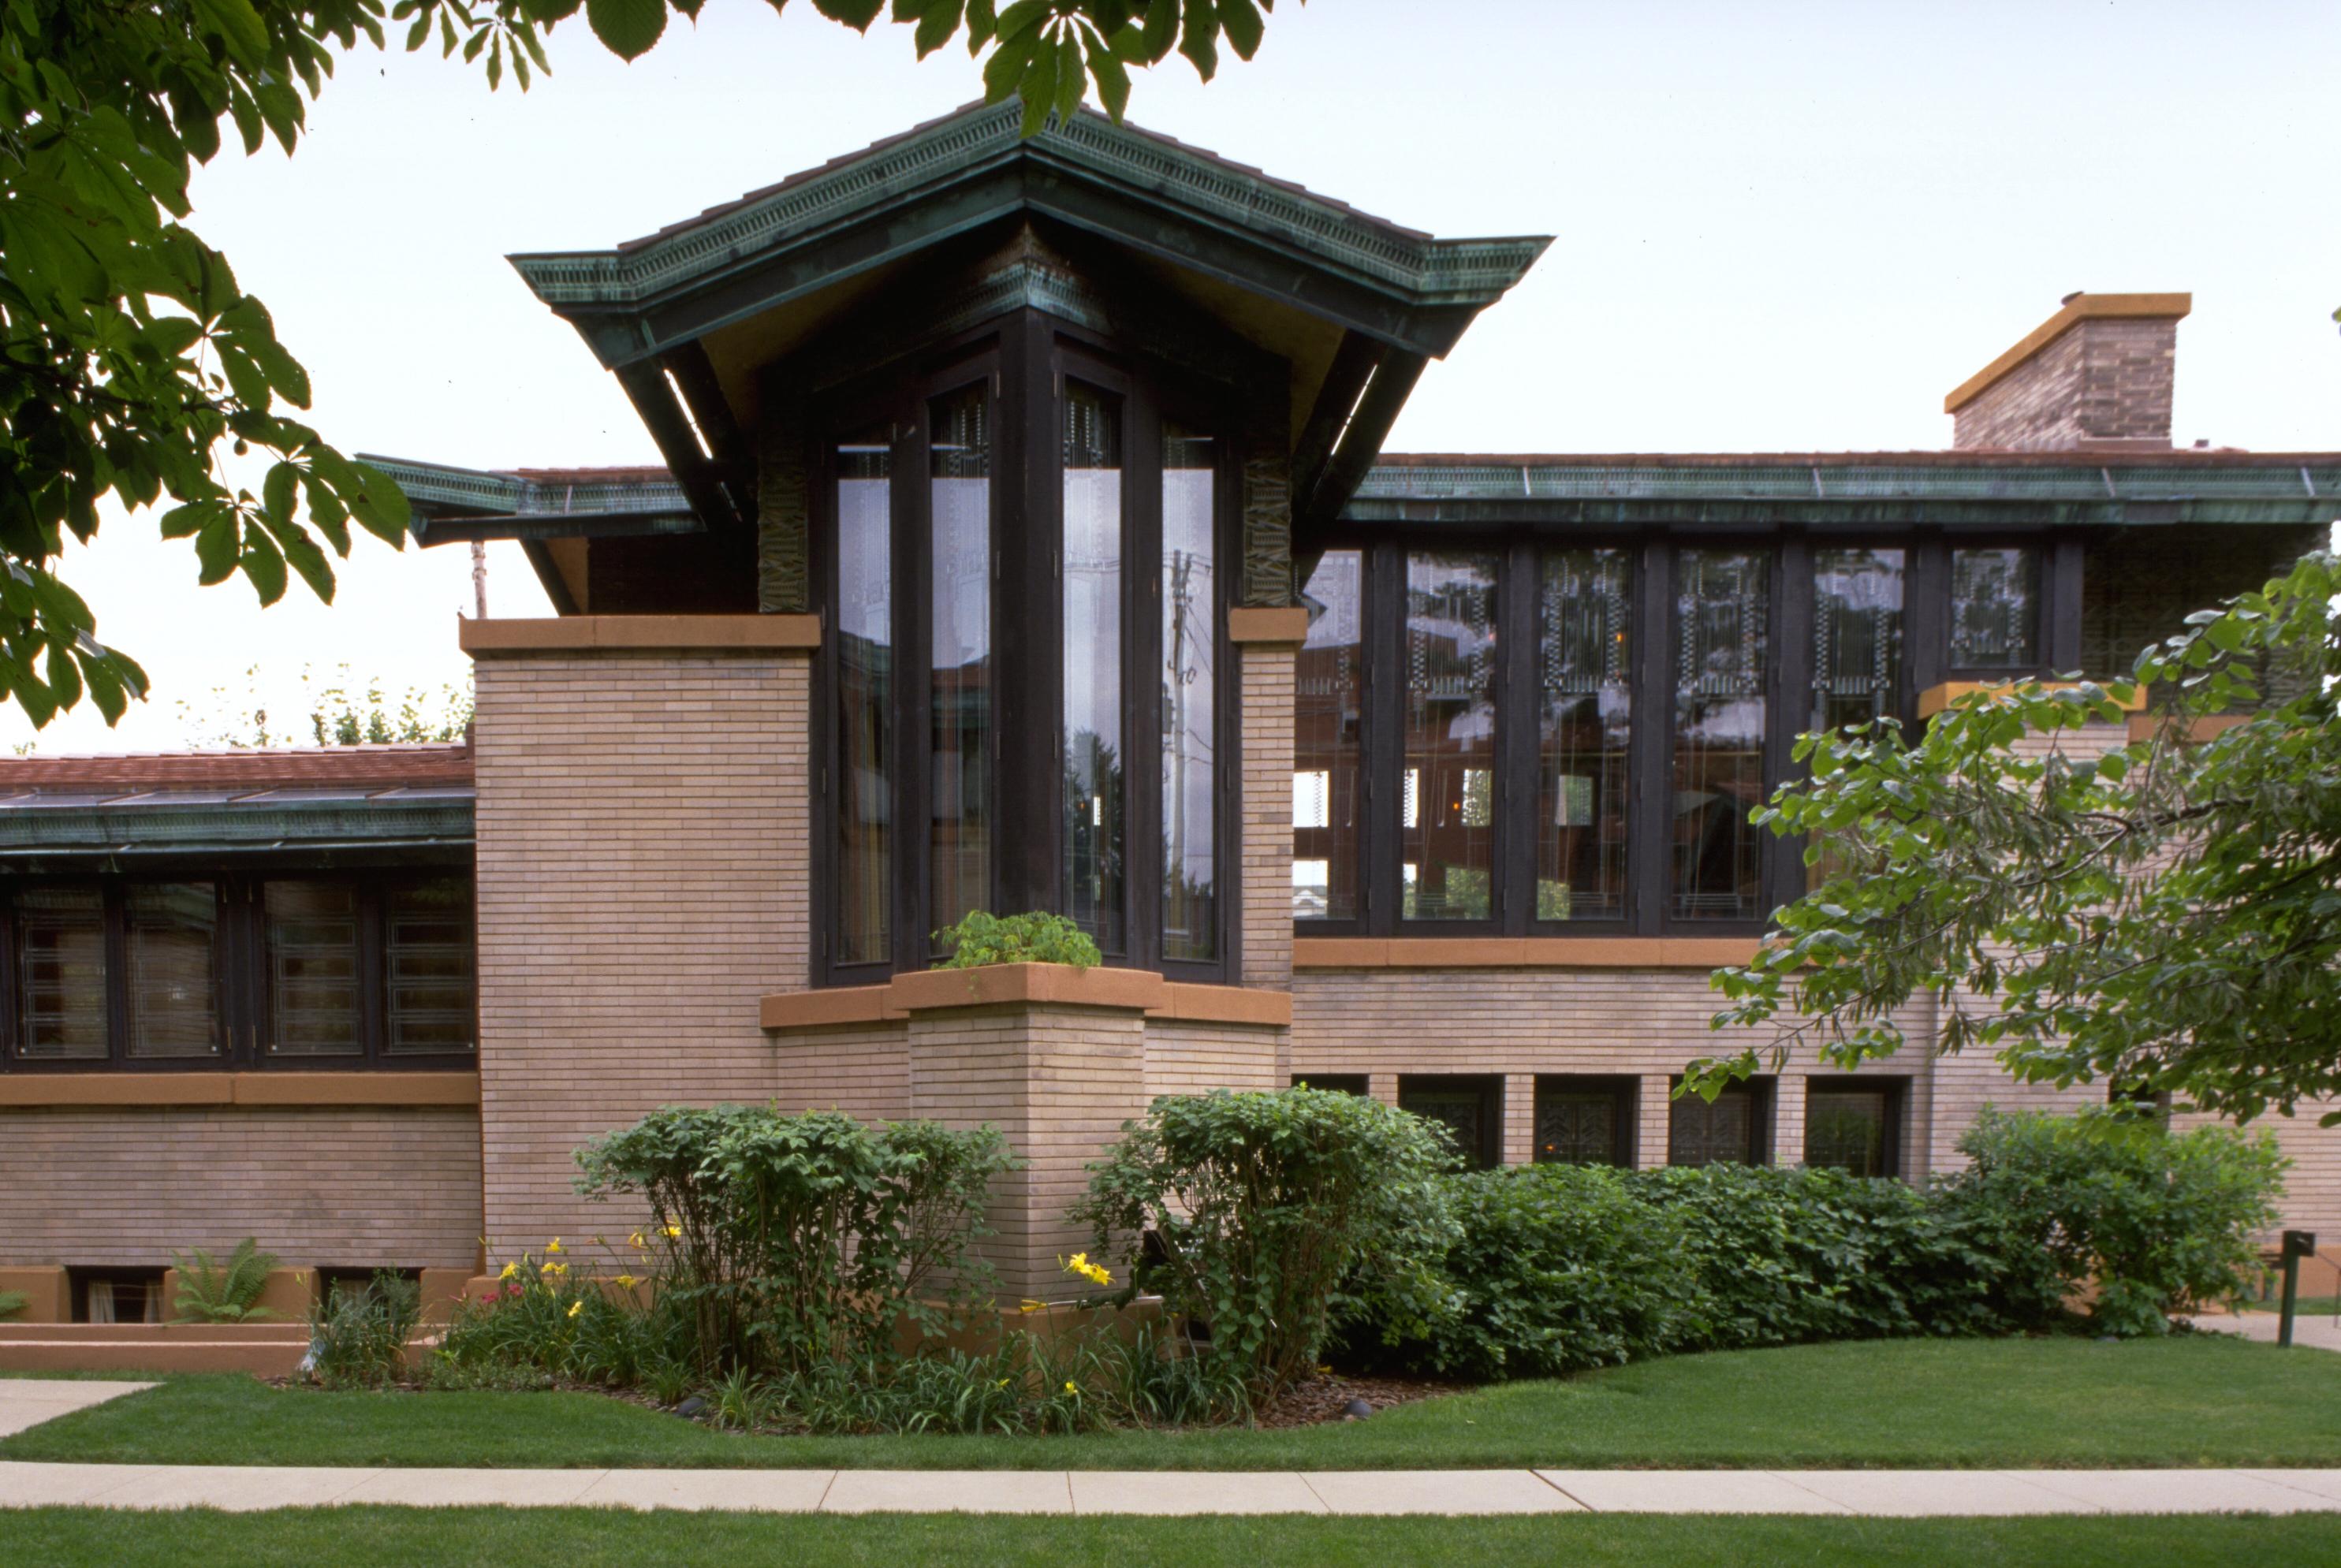 Lloyd Frank Wright Houses dana-thomas house - frank lloyd wright design | enjoy illinois